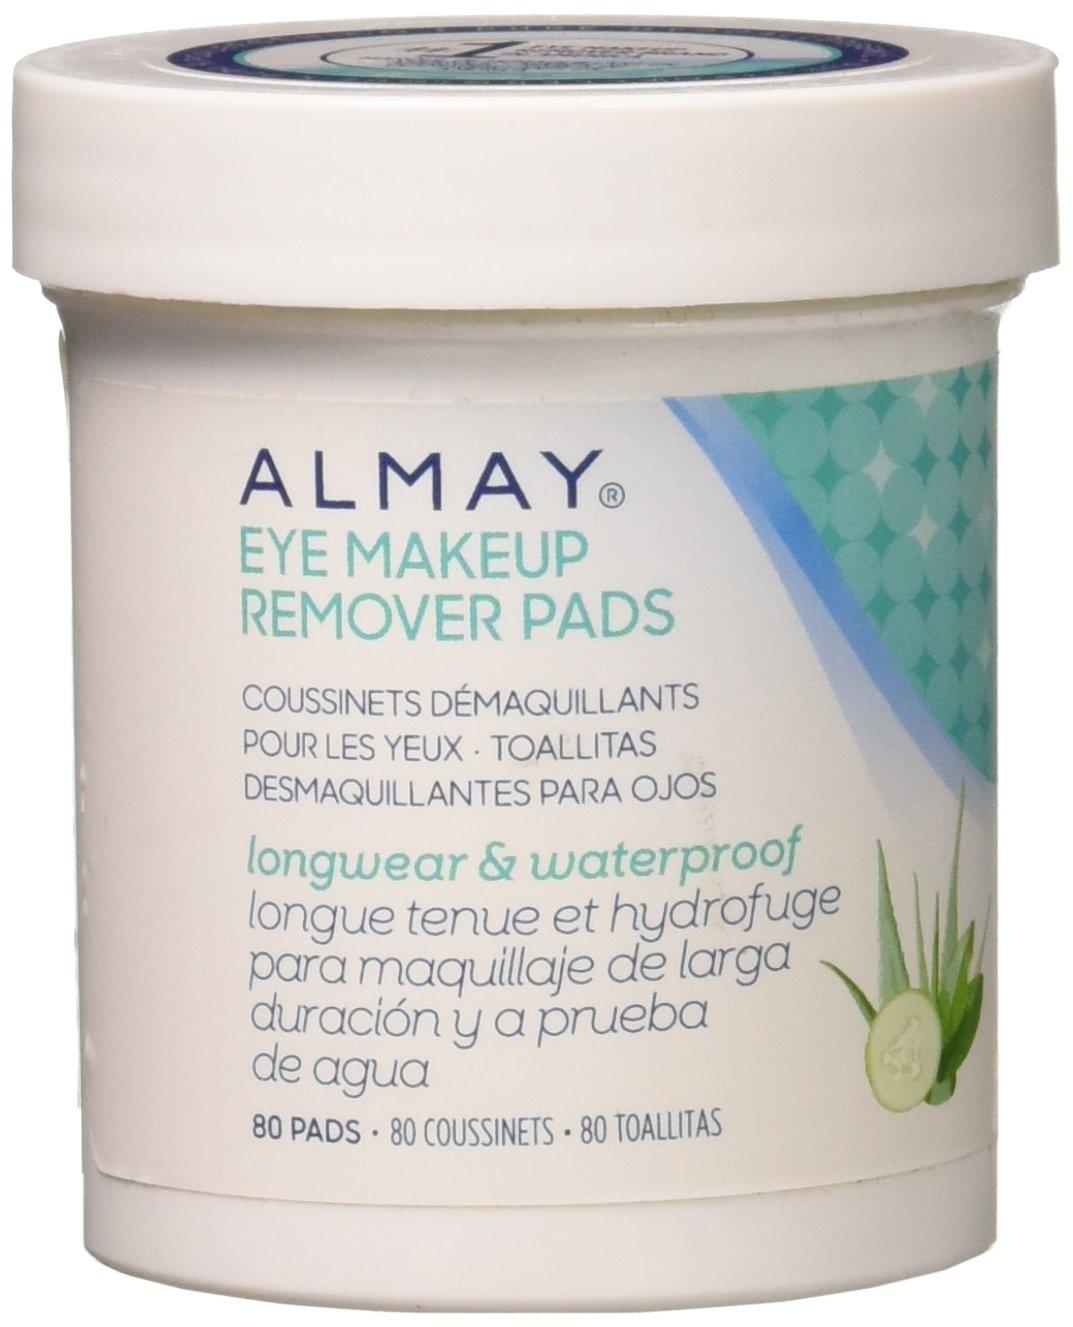 Almay Longwear & Waterproof Eye Makeup Remover Pads, 80 Count : Beauty